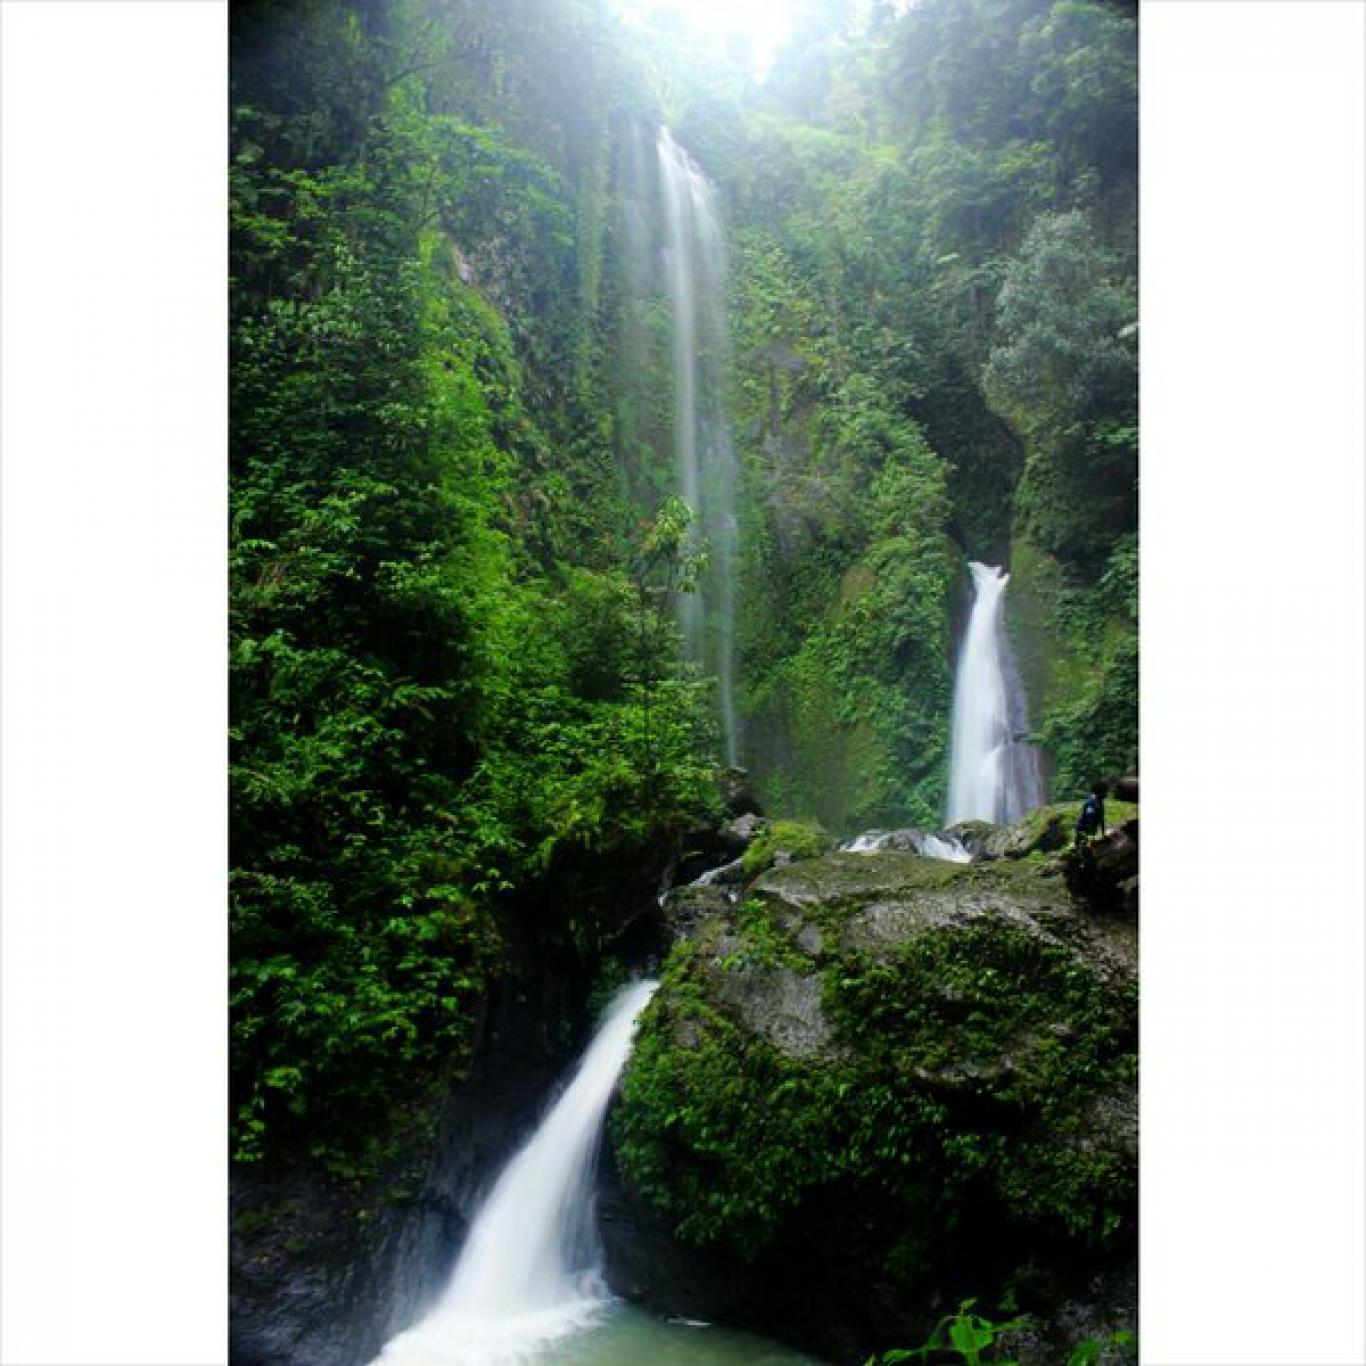 Website Gumantar Tiyu Ngumbak Acara Adat Wisata Desa Terjun Ombaq